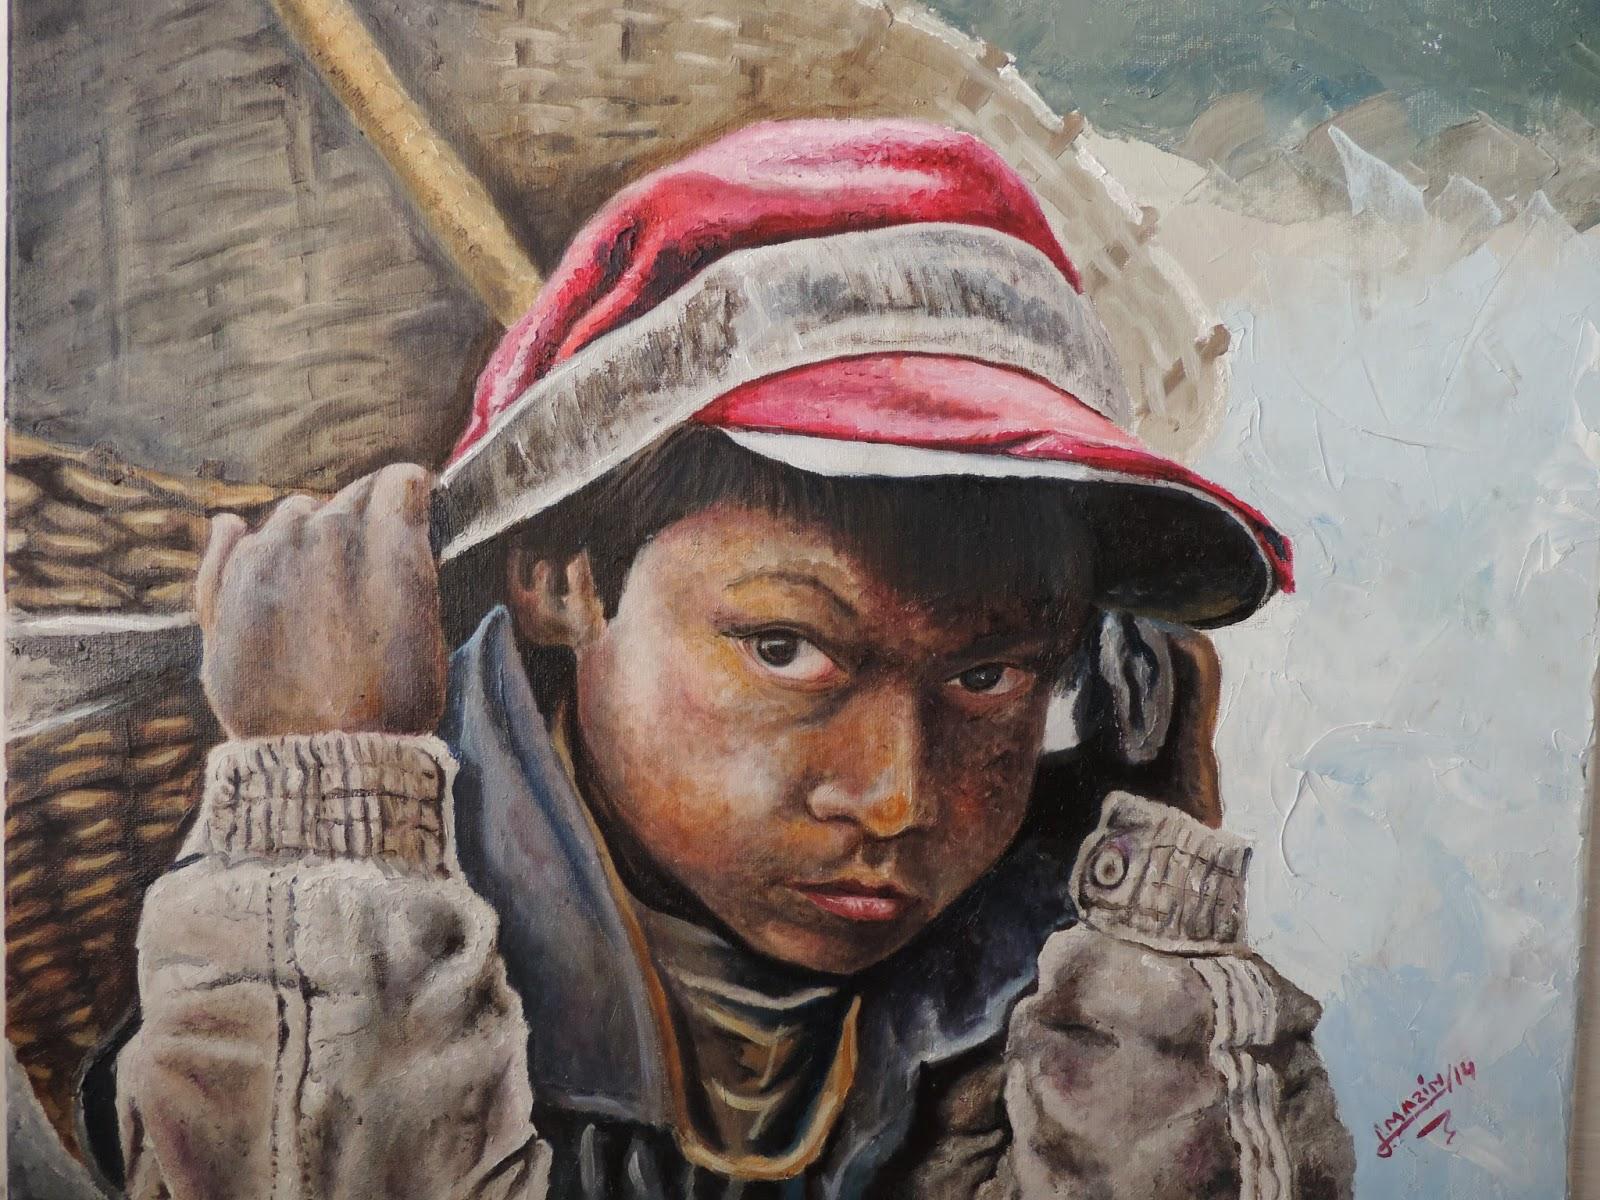 pintores Colombianos, jorge marín artista